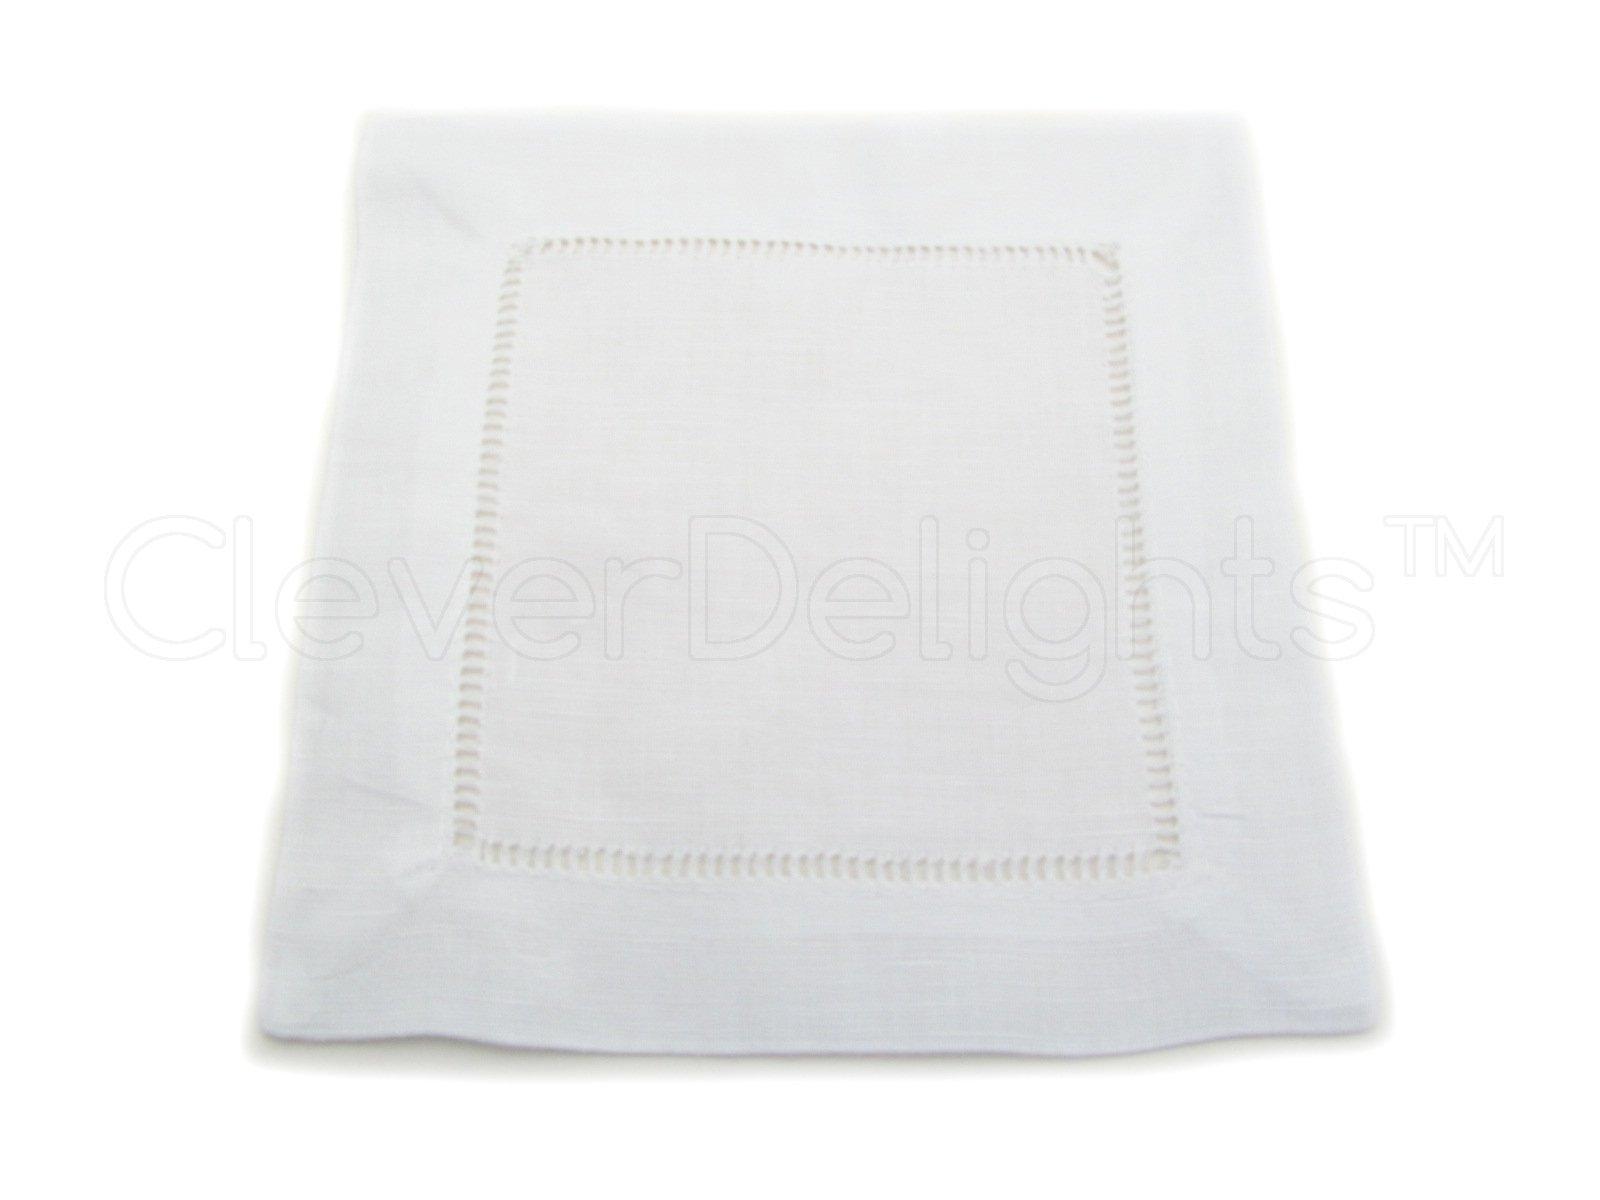 12 CleverDelights White 100% Cotton Hemstitch Cocktail Napkins - 6'' x 6'' Ladder Hemstitch Cloth Beverage Napkins - 100% Cotton 6 Inch Coaster